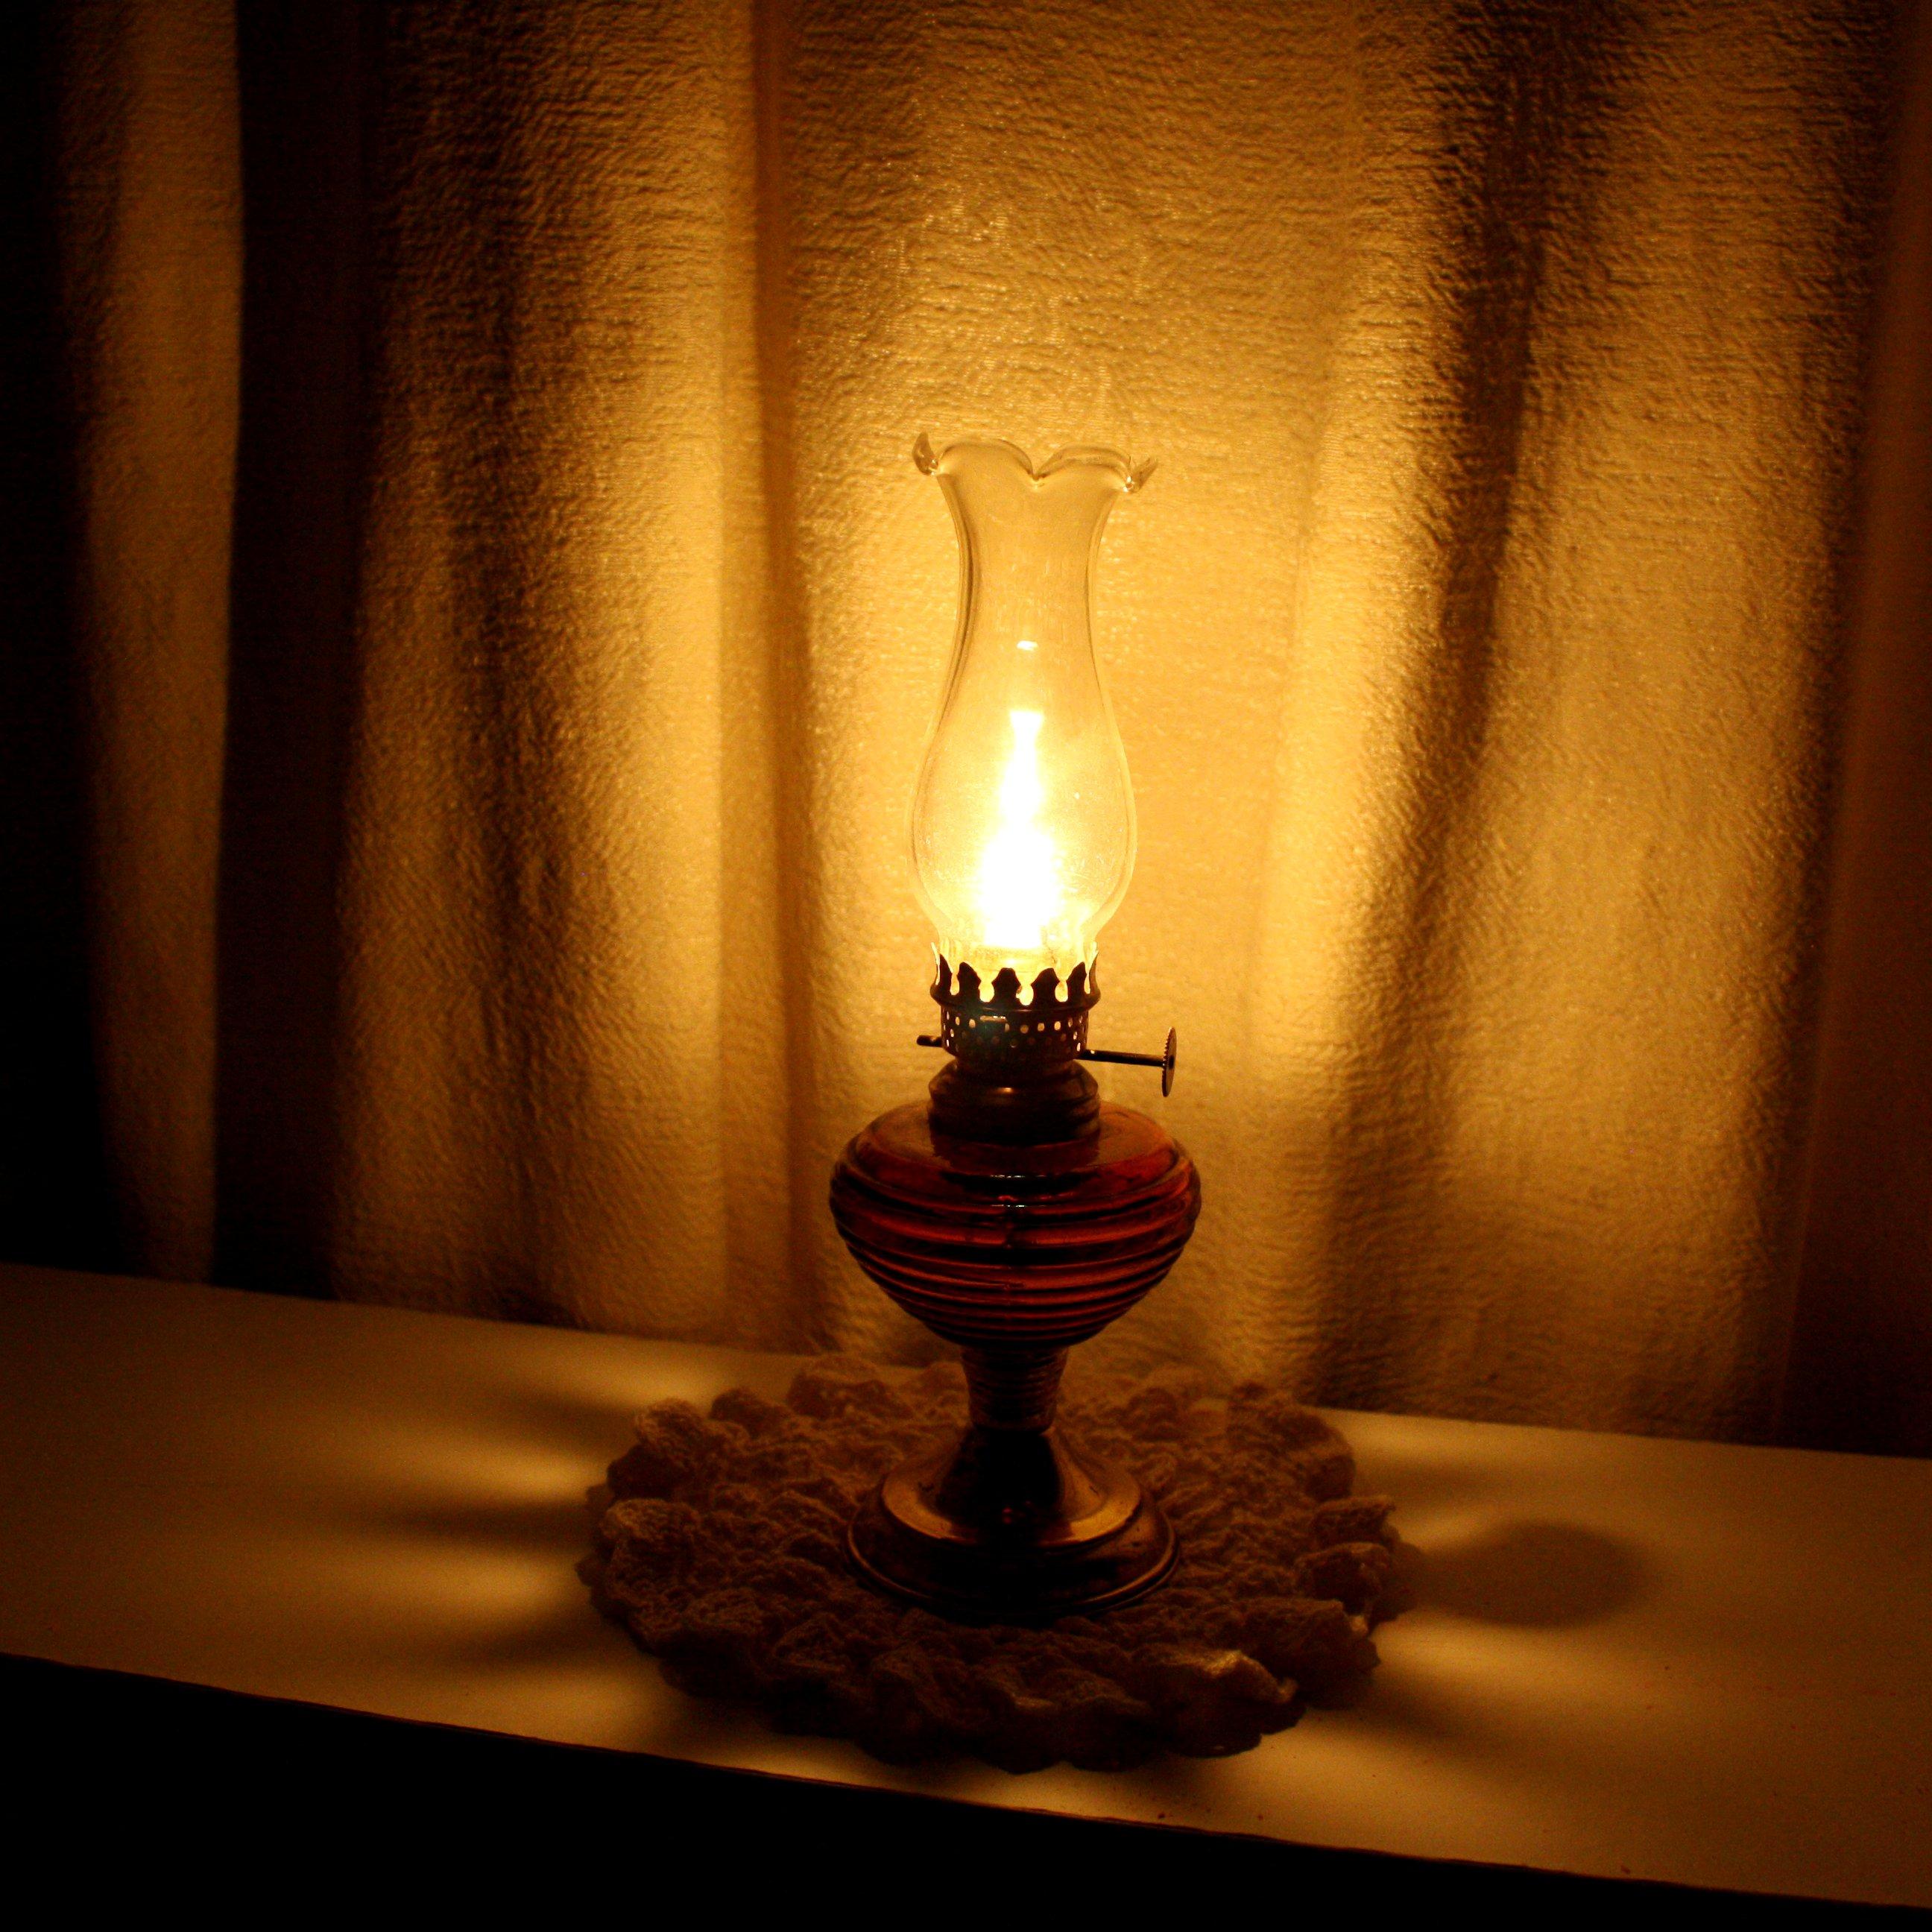 oil burning lamp | eBay